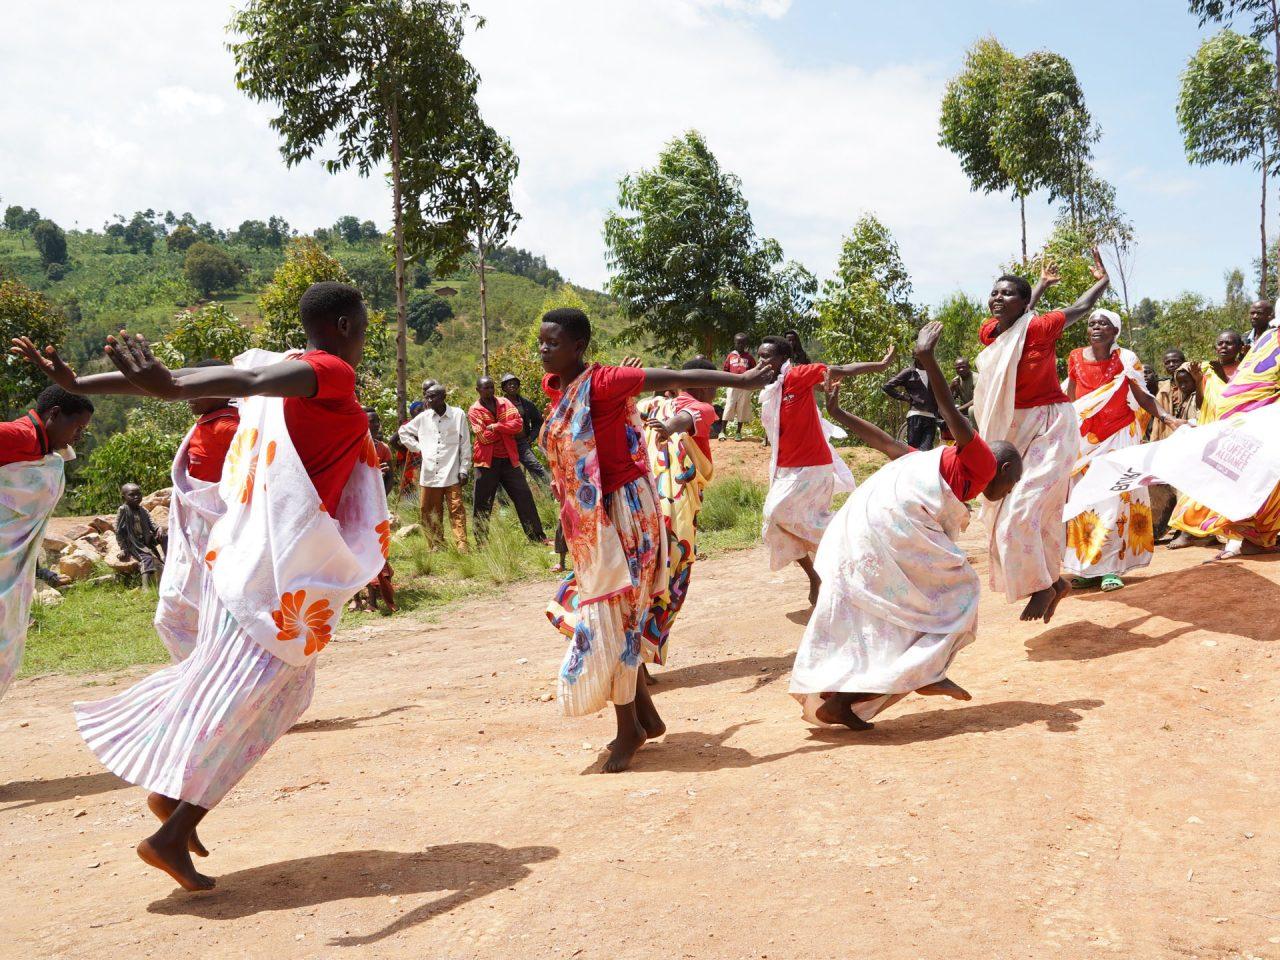 Women of Turihamwe group dancing